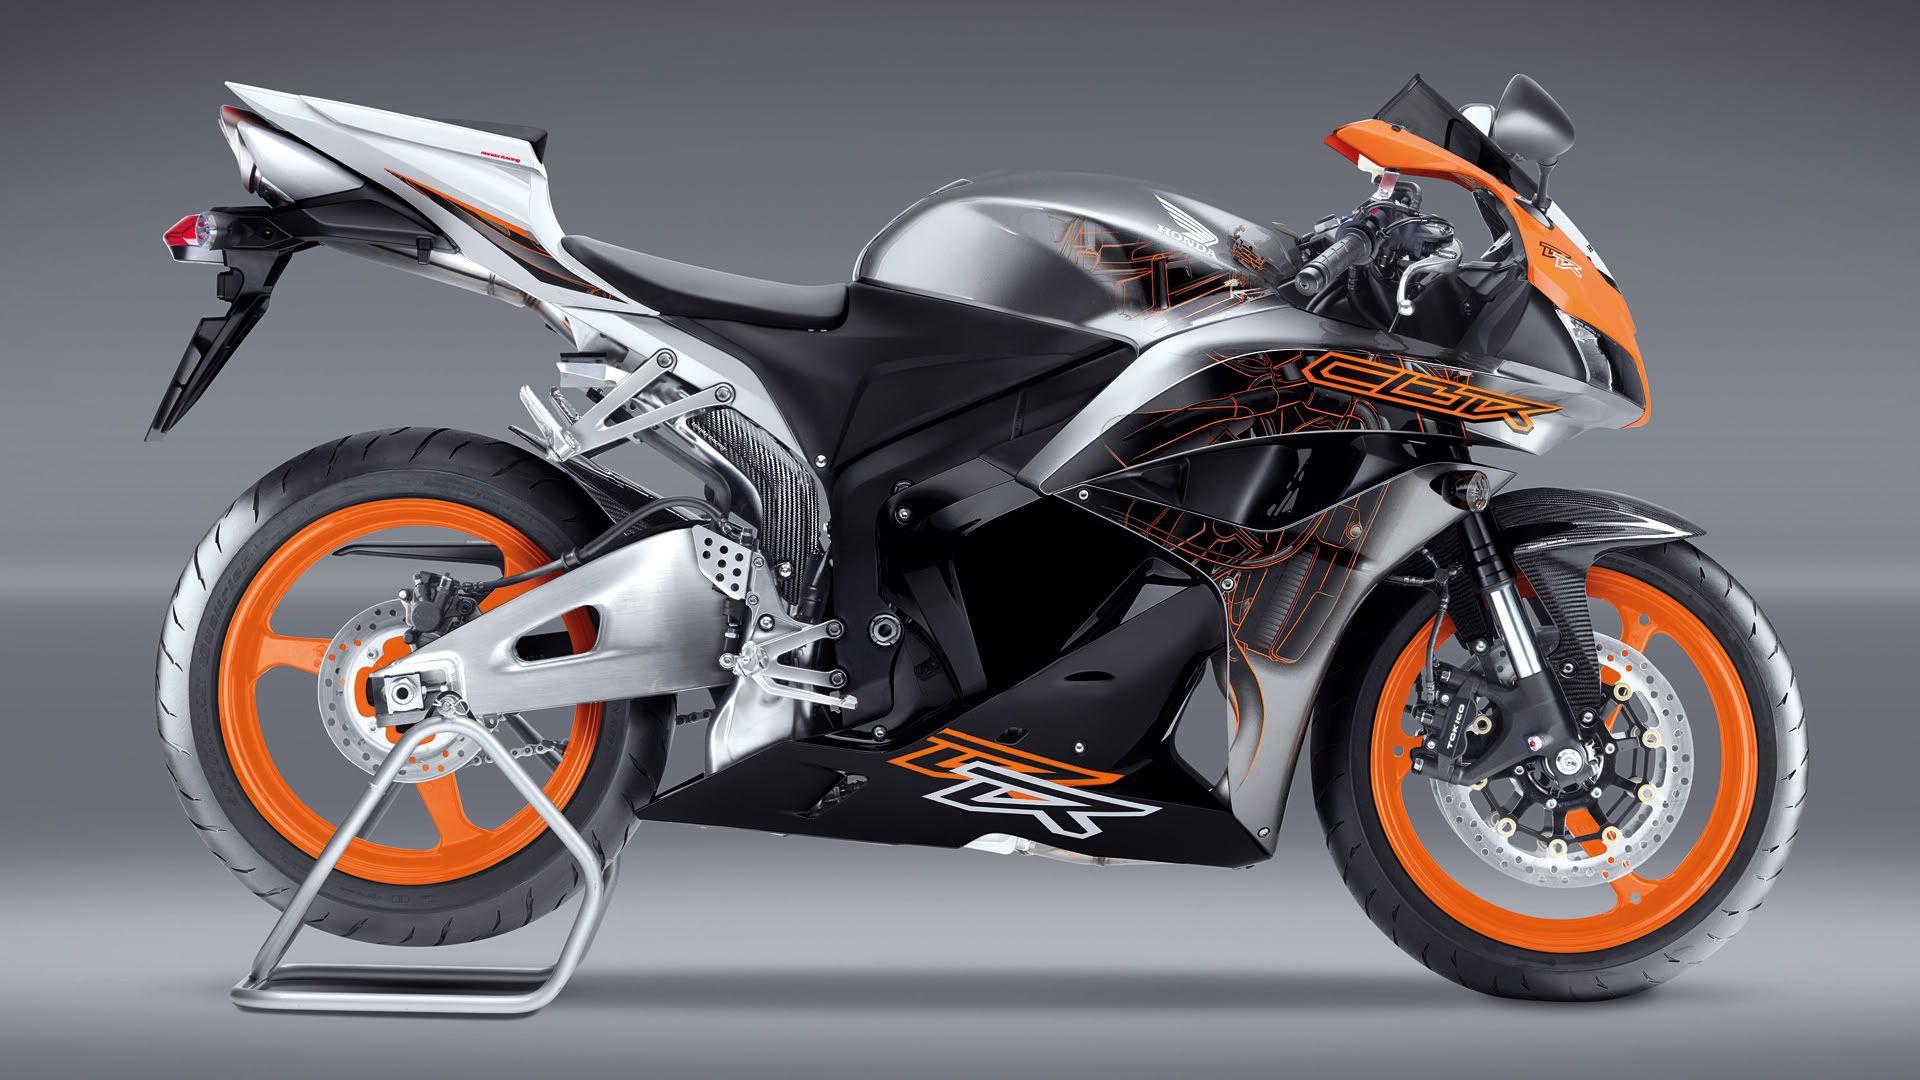 Honda CBR 600RR 2011 - HD Motorcycle Wallpaper (1920x1080 ...Honda Superbike 2013 Wallpaper